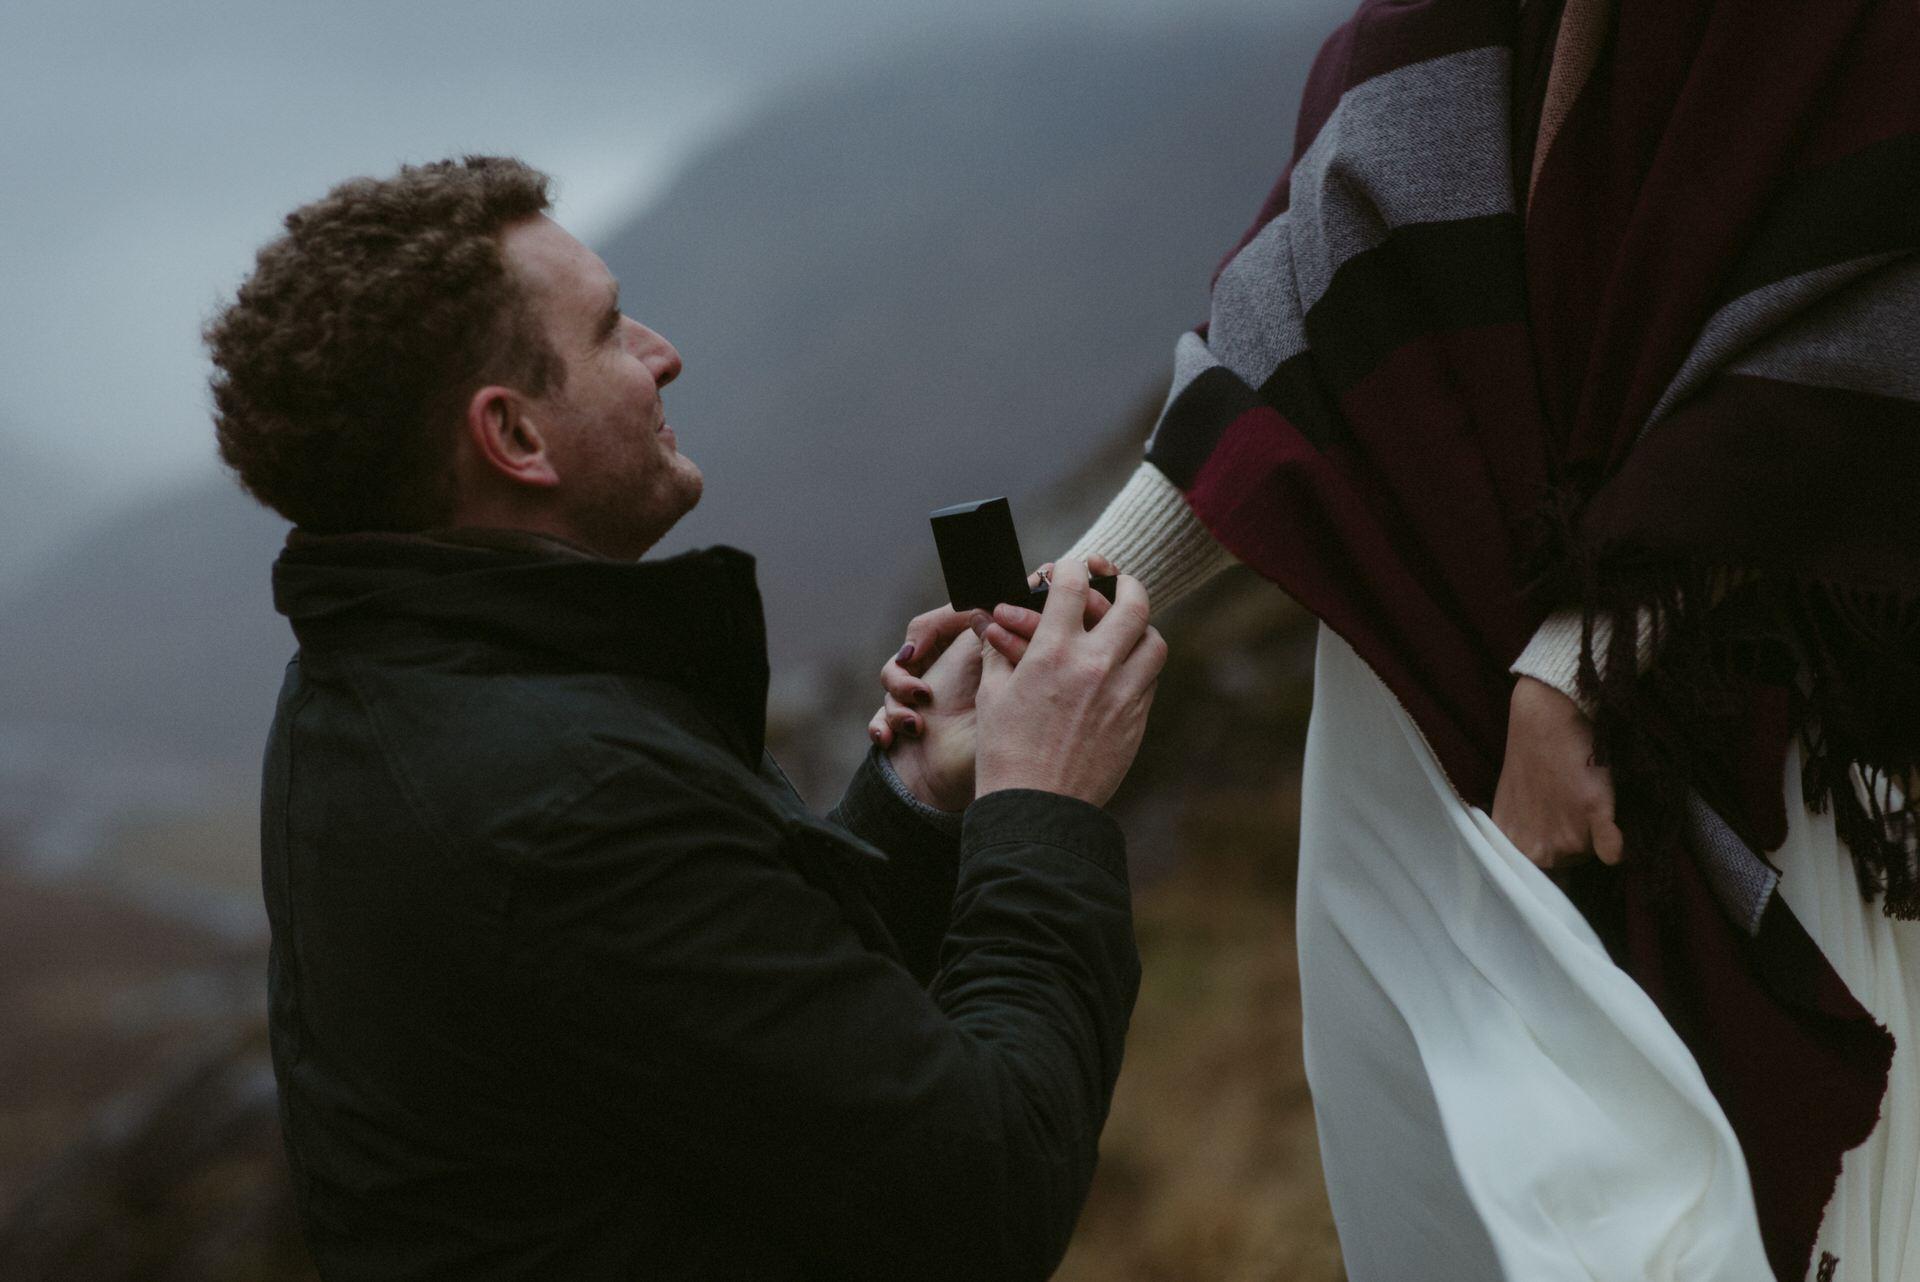 Surprise-Marriage-Proposal-Glencoe_53